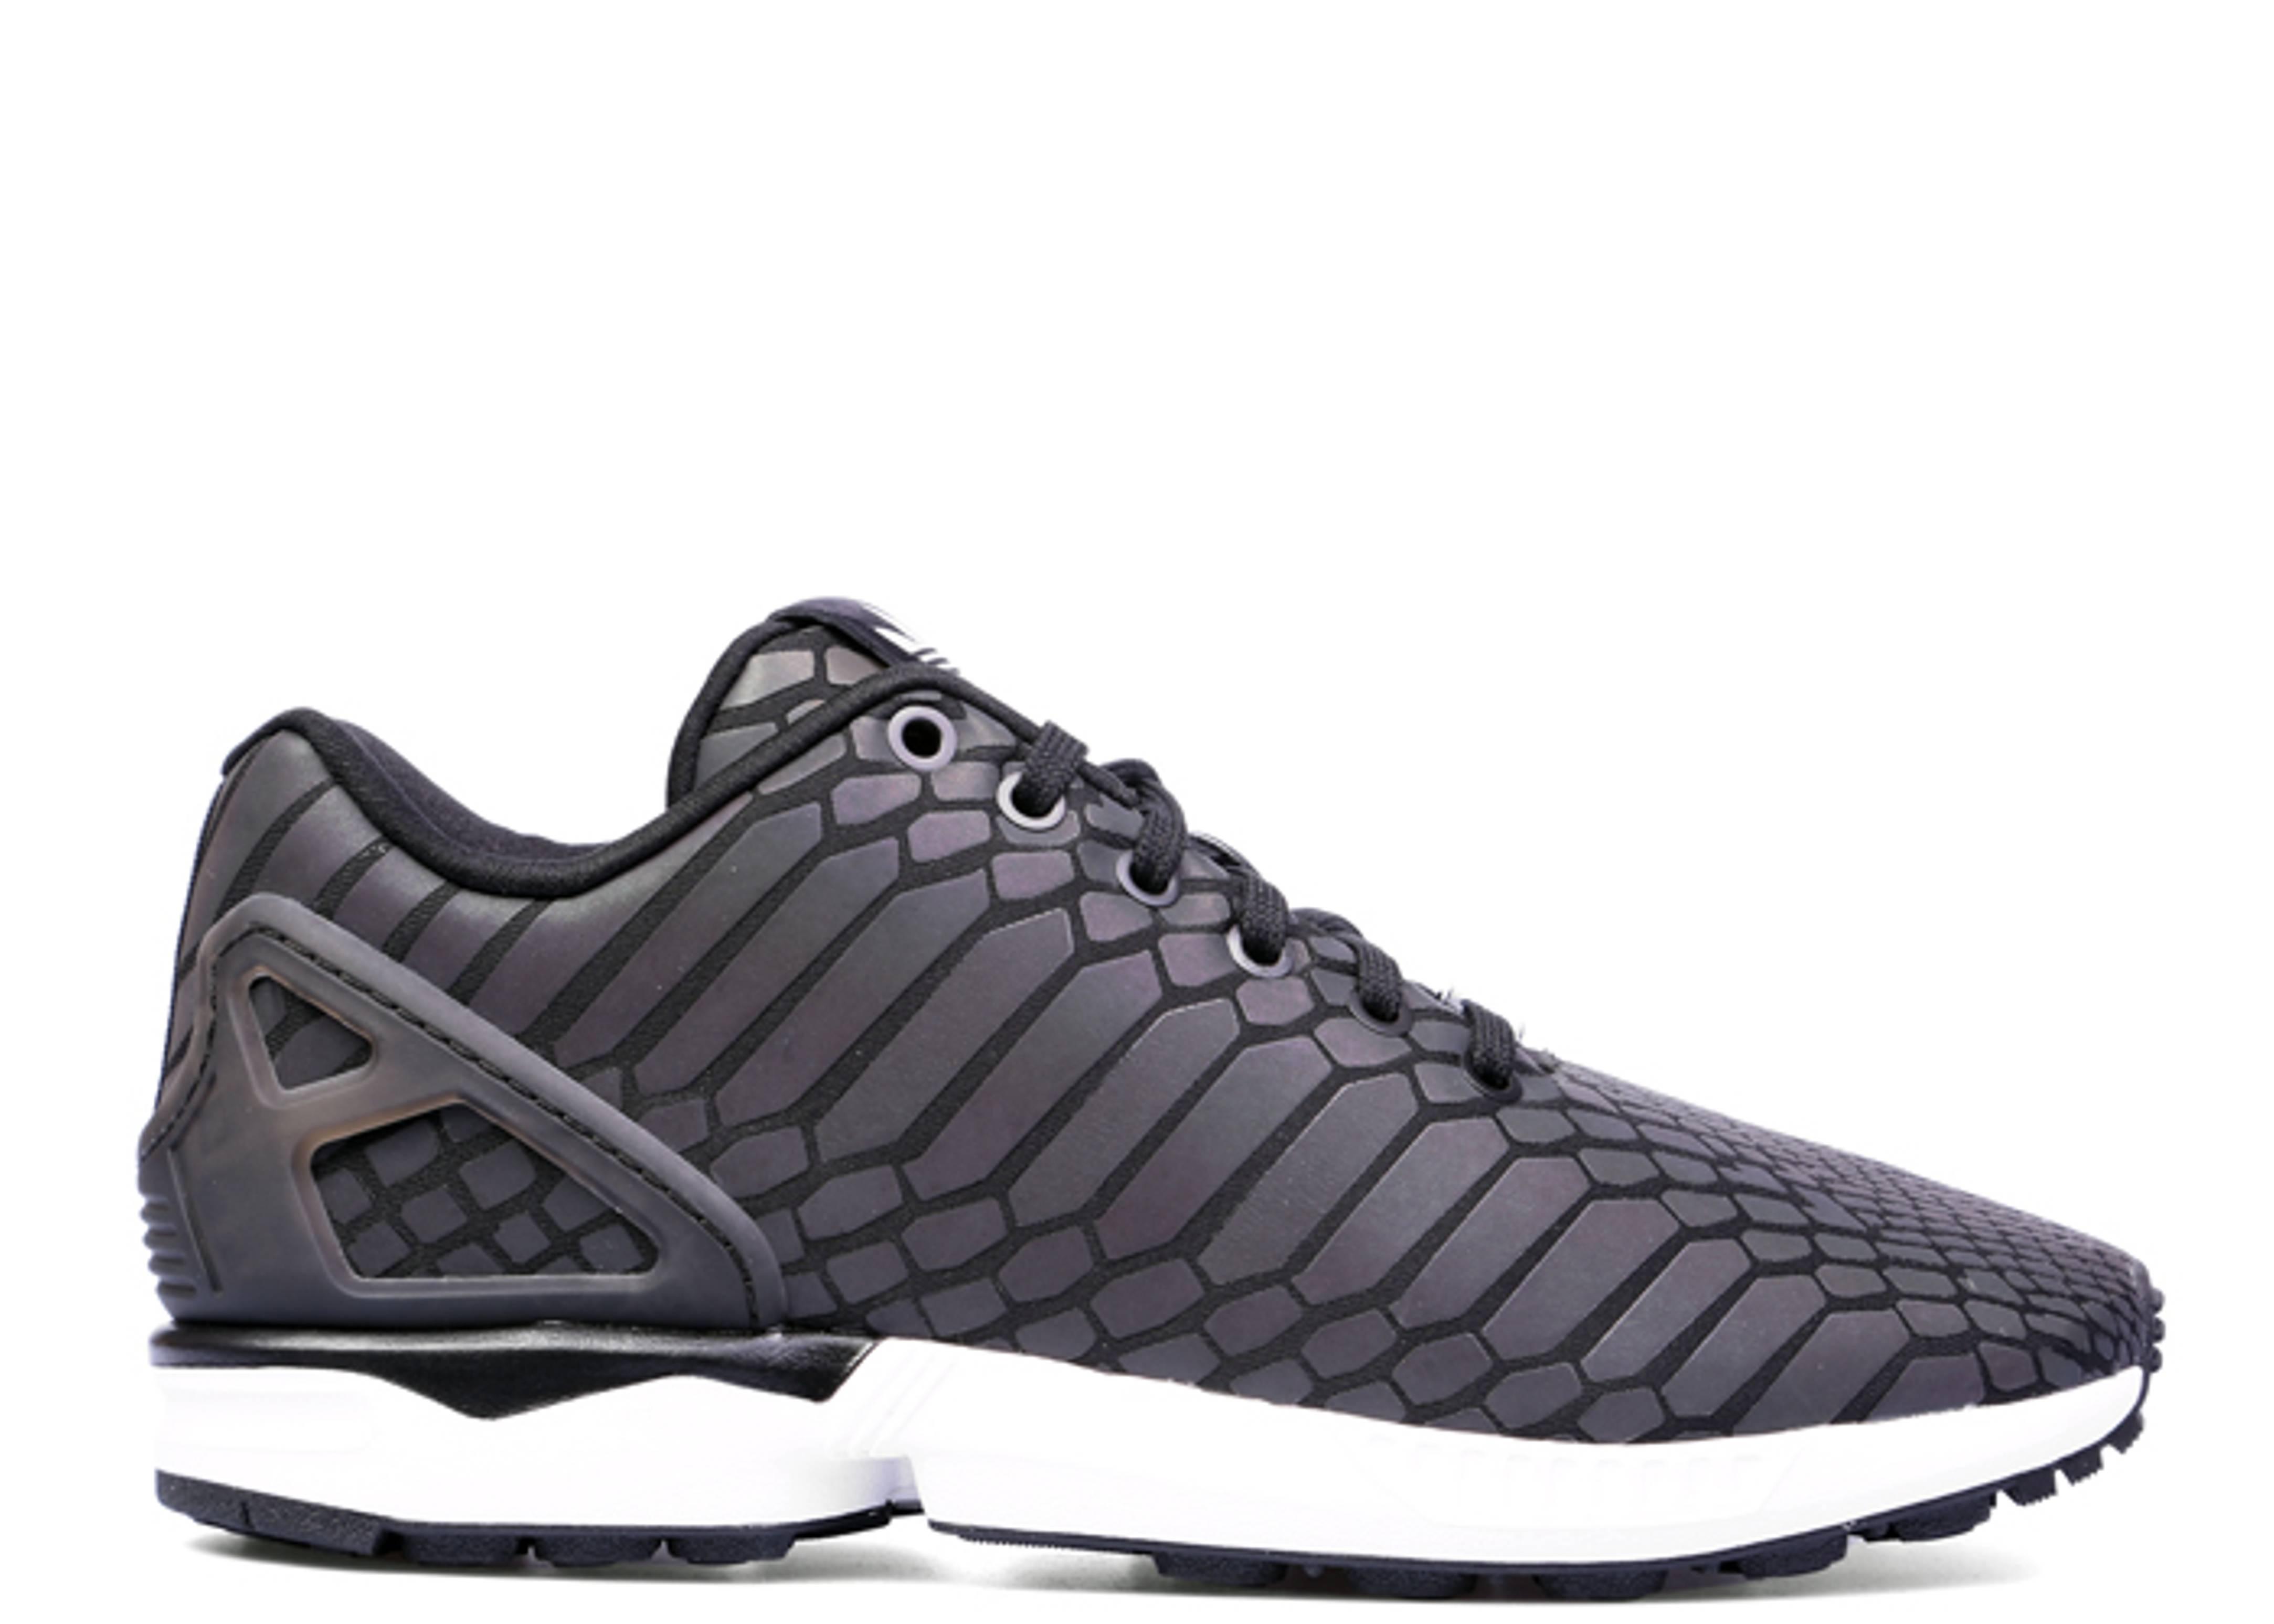 zx flux adidas reflective online -